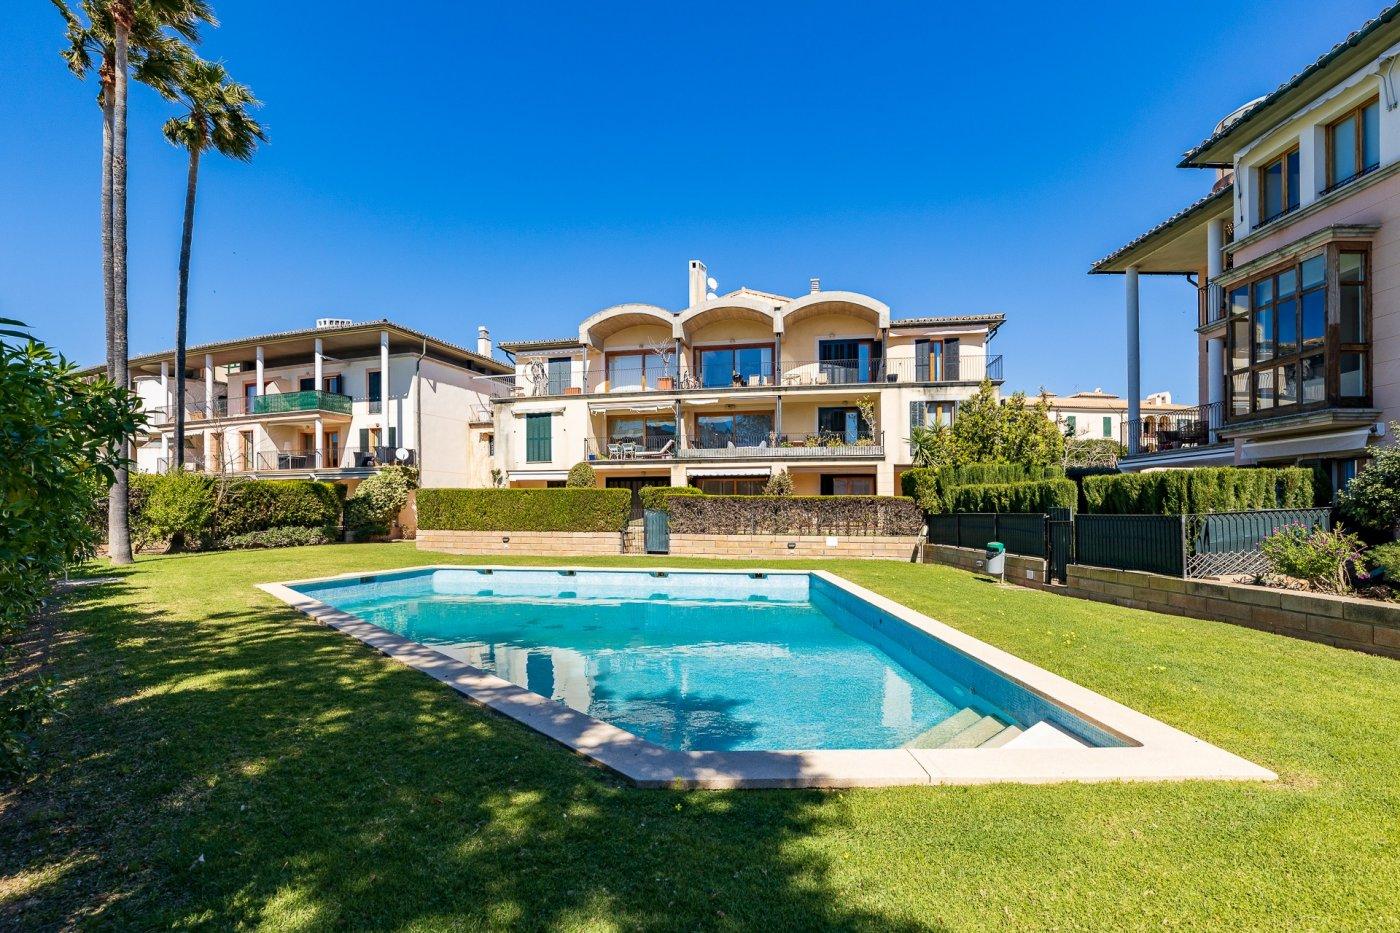 Zona colegios. arabella park. se vende atico con piscina comunitaria. palma mallorca - imagenInmueble25